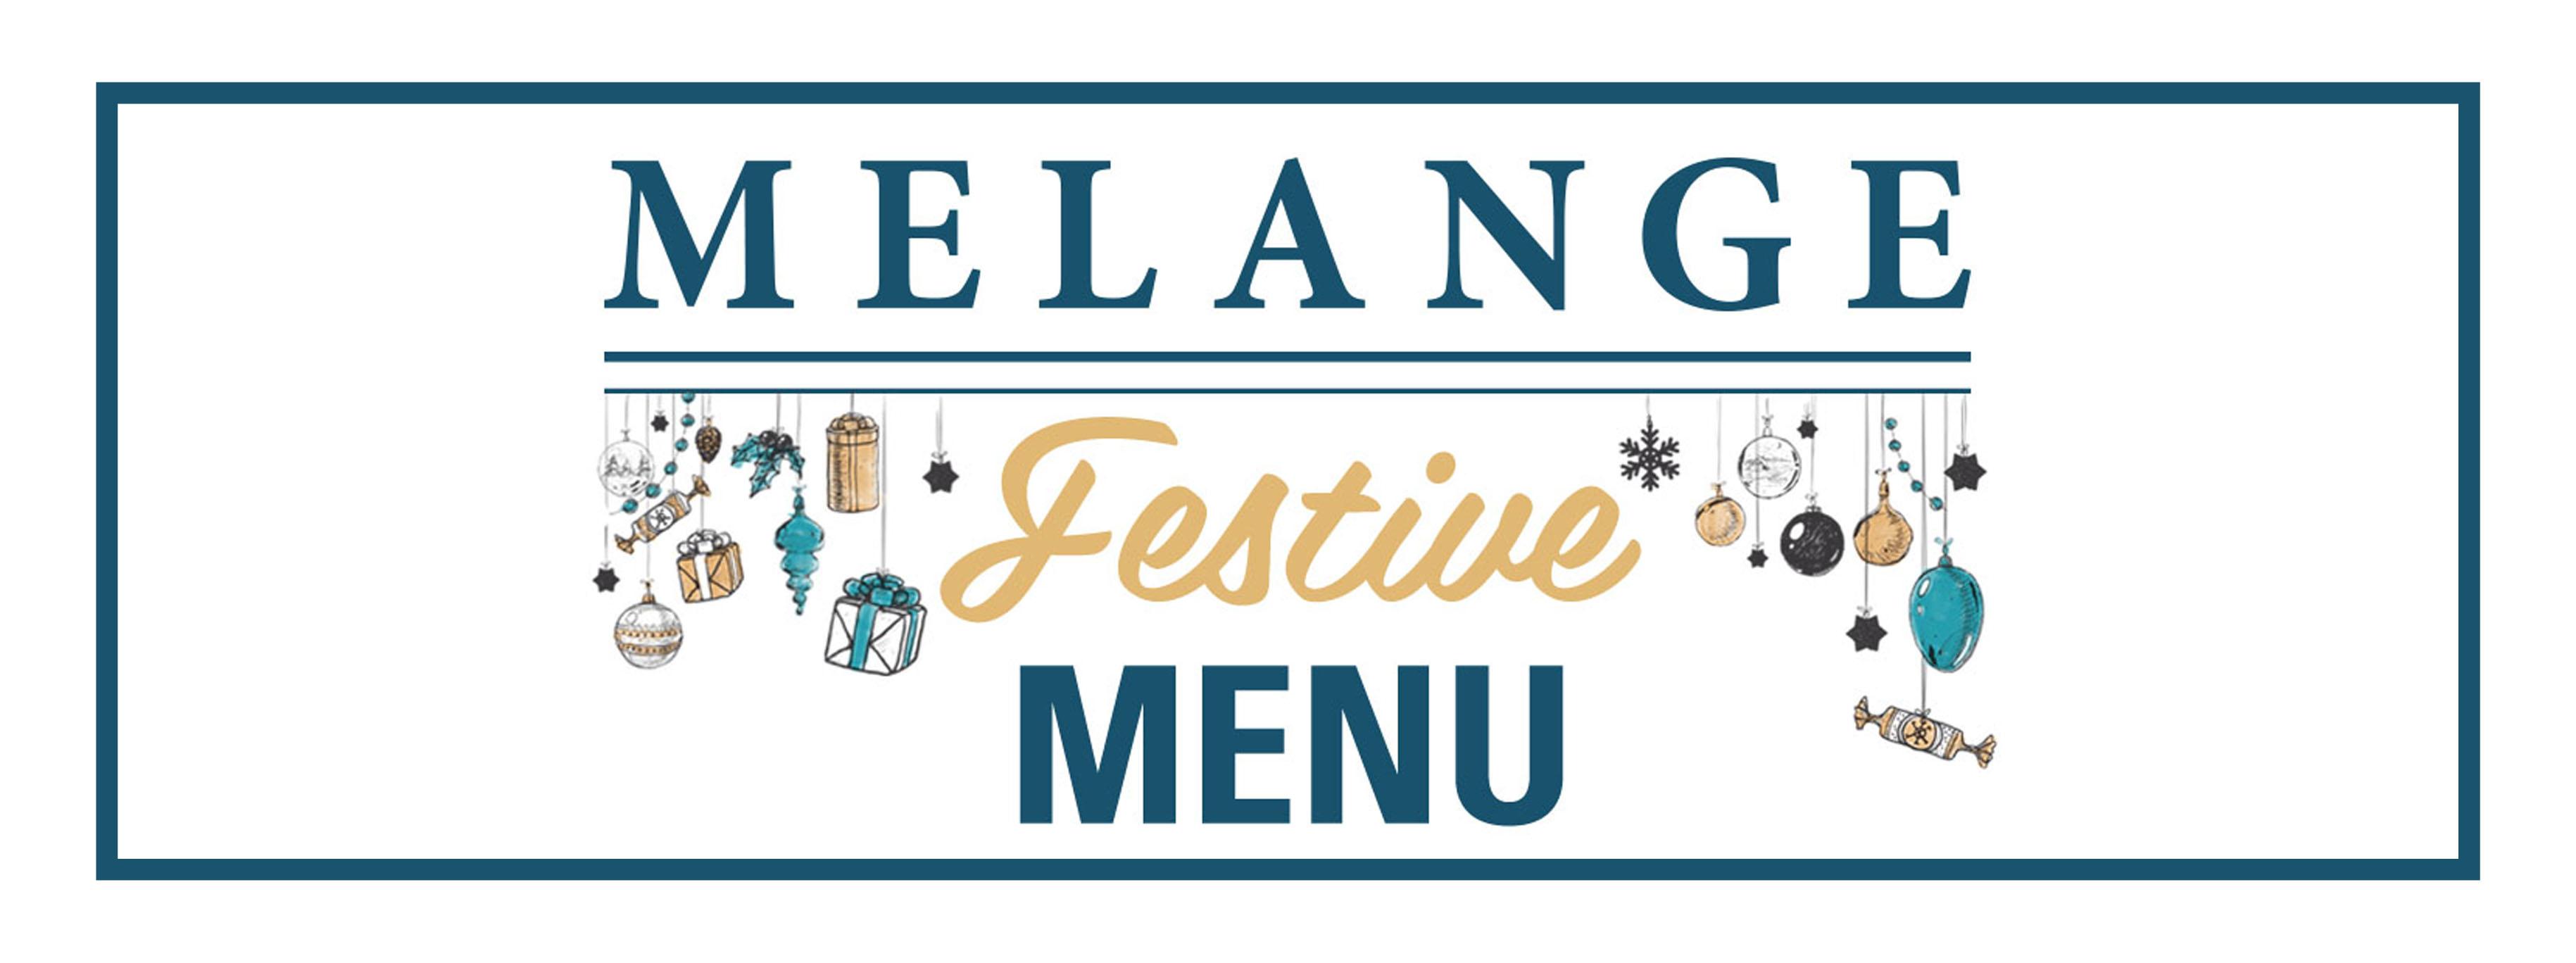 menu-icons-Christmas-border-2